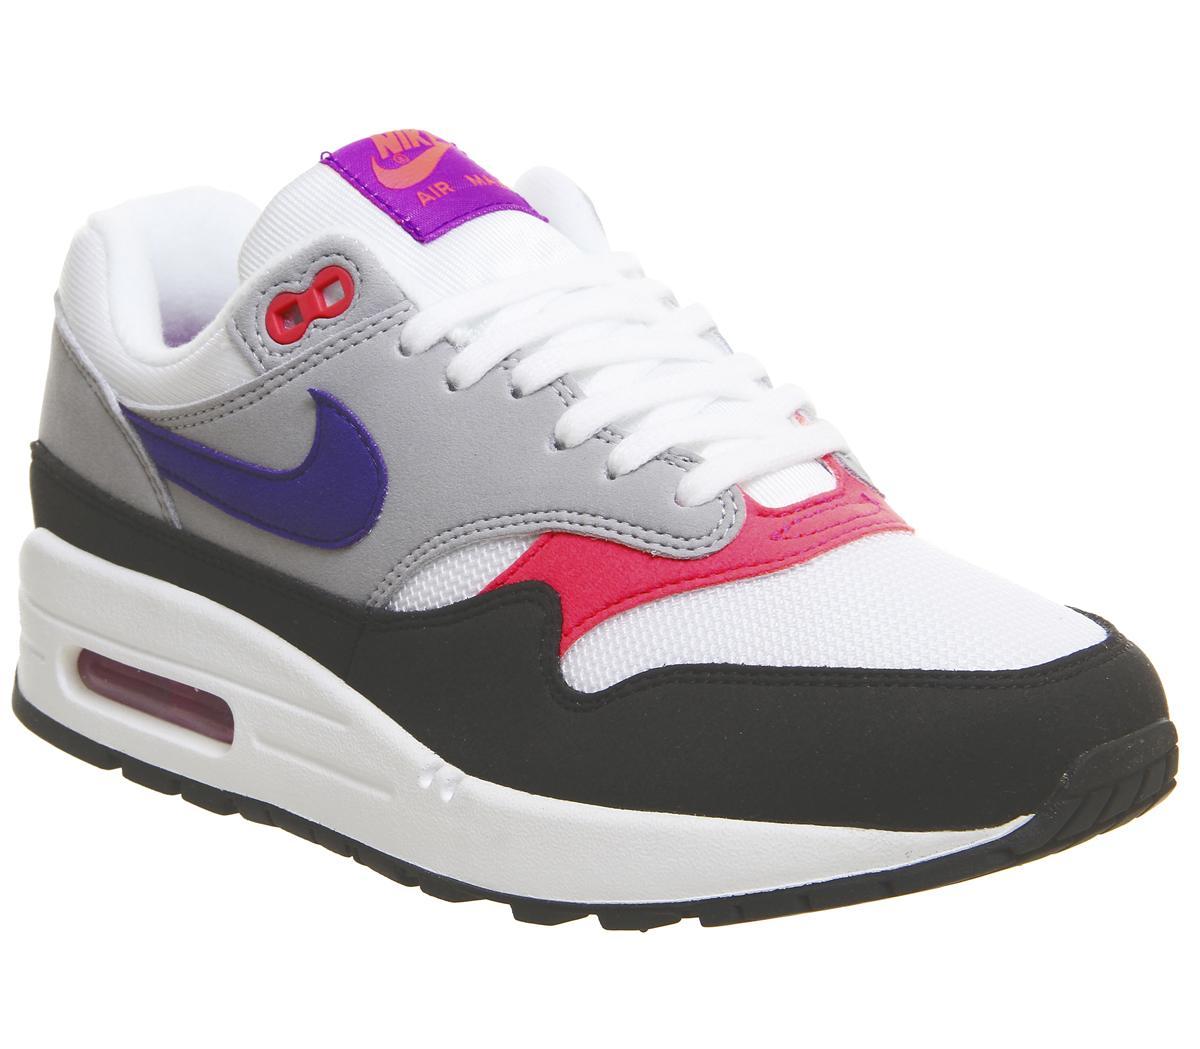 Nike Air Max 1 shoes white purple grey